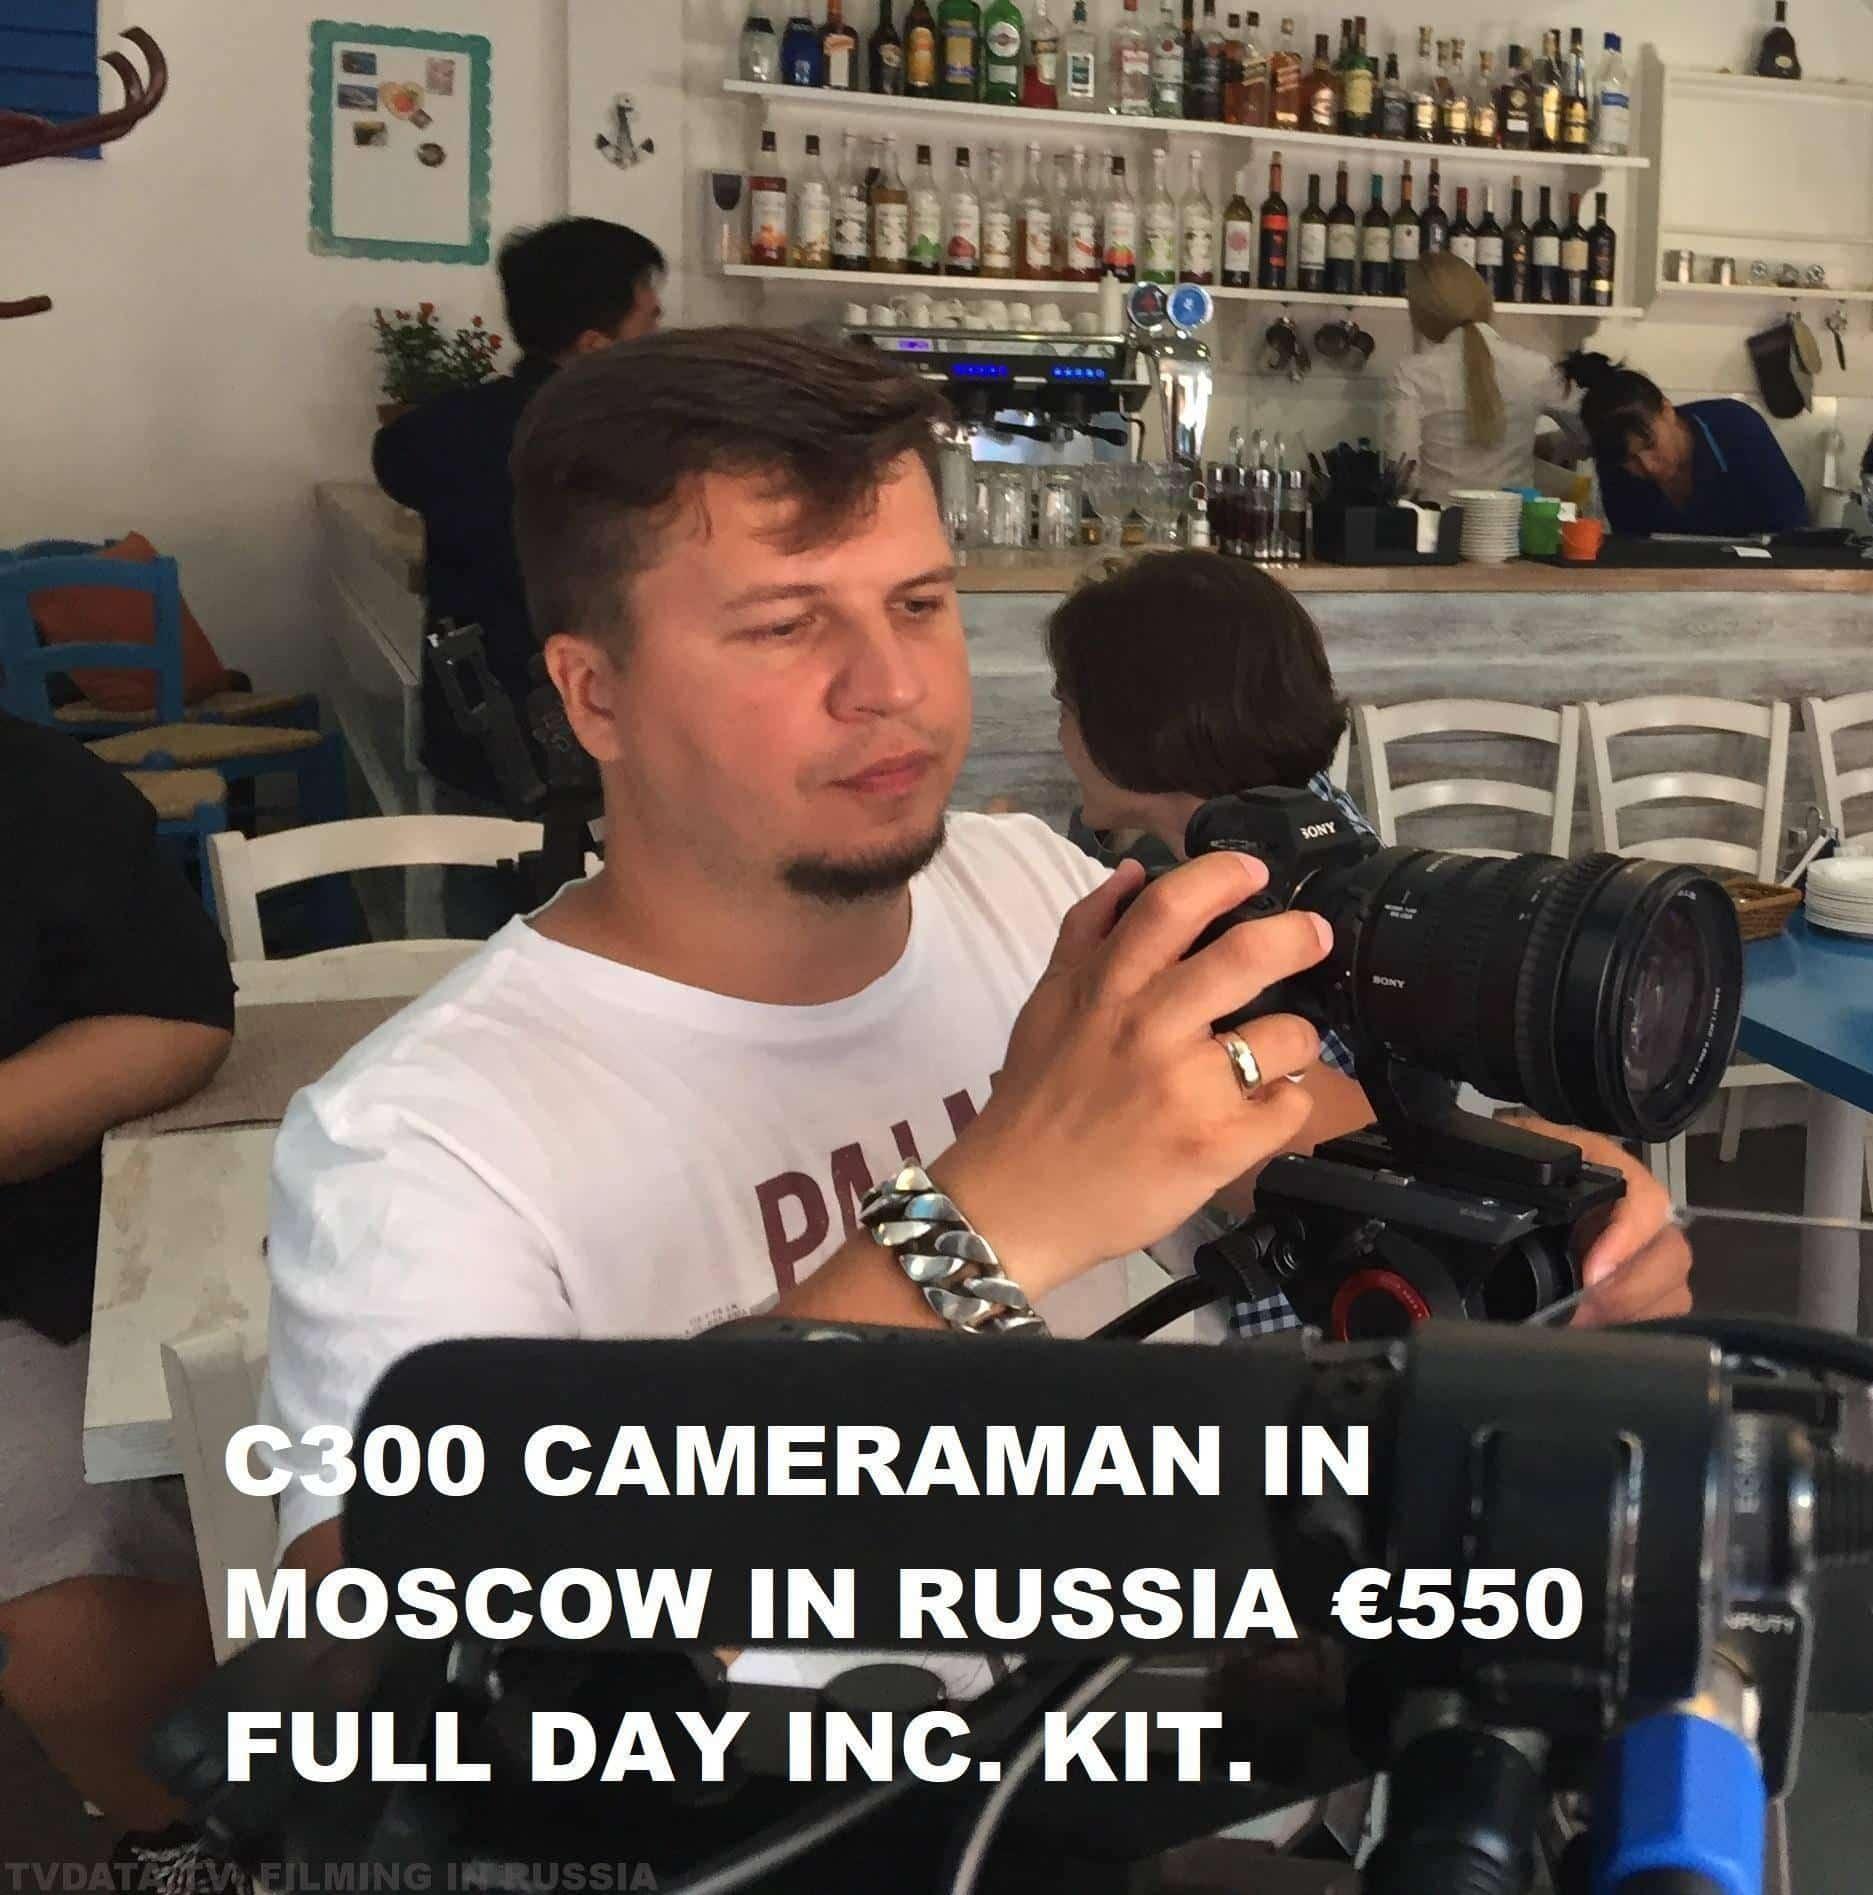 C300 CAMERAMAN IN MOSCOW IN RUSSIA €550 FULL DAY INC. KIT. CAMERAMAN@TVDATA.TV